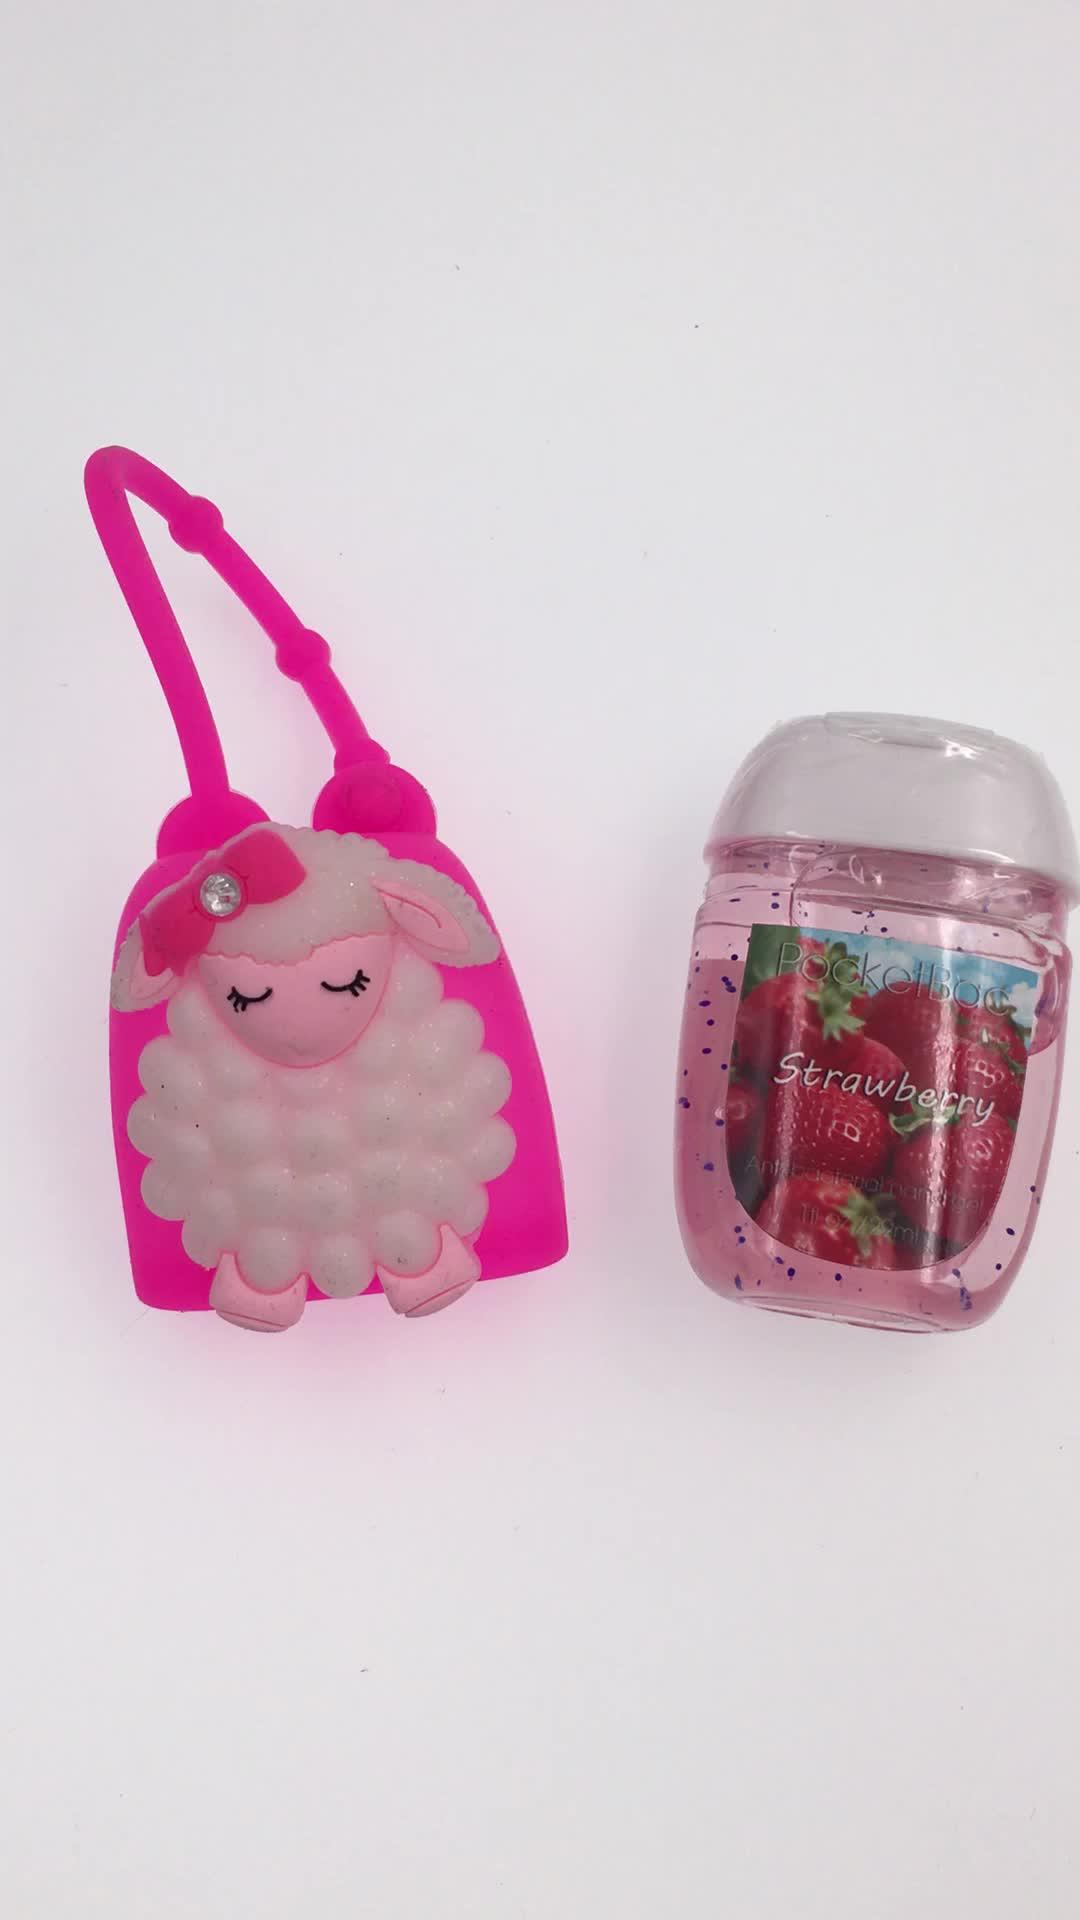 Bath & Body Works POCKETBAC Anti Batterica Mano Gel Disinfettante Per Le Mani